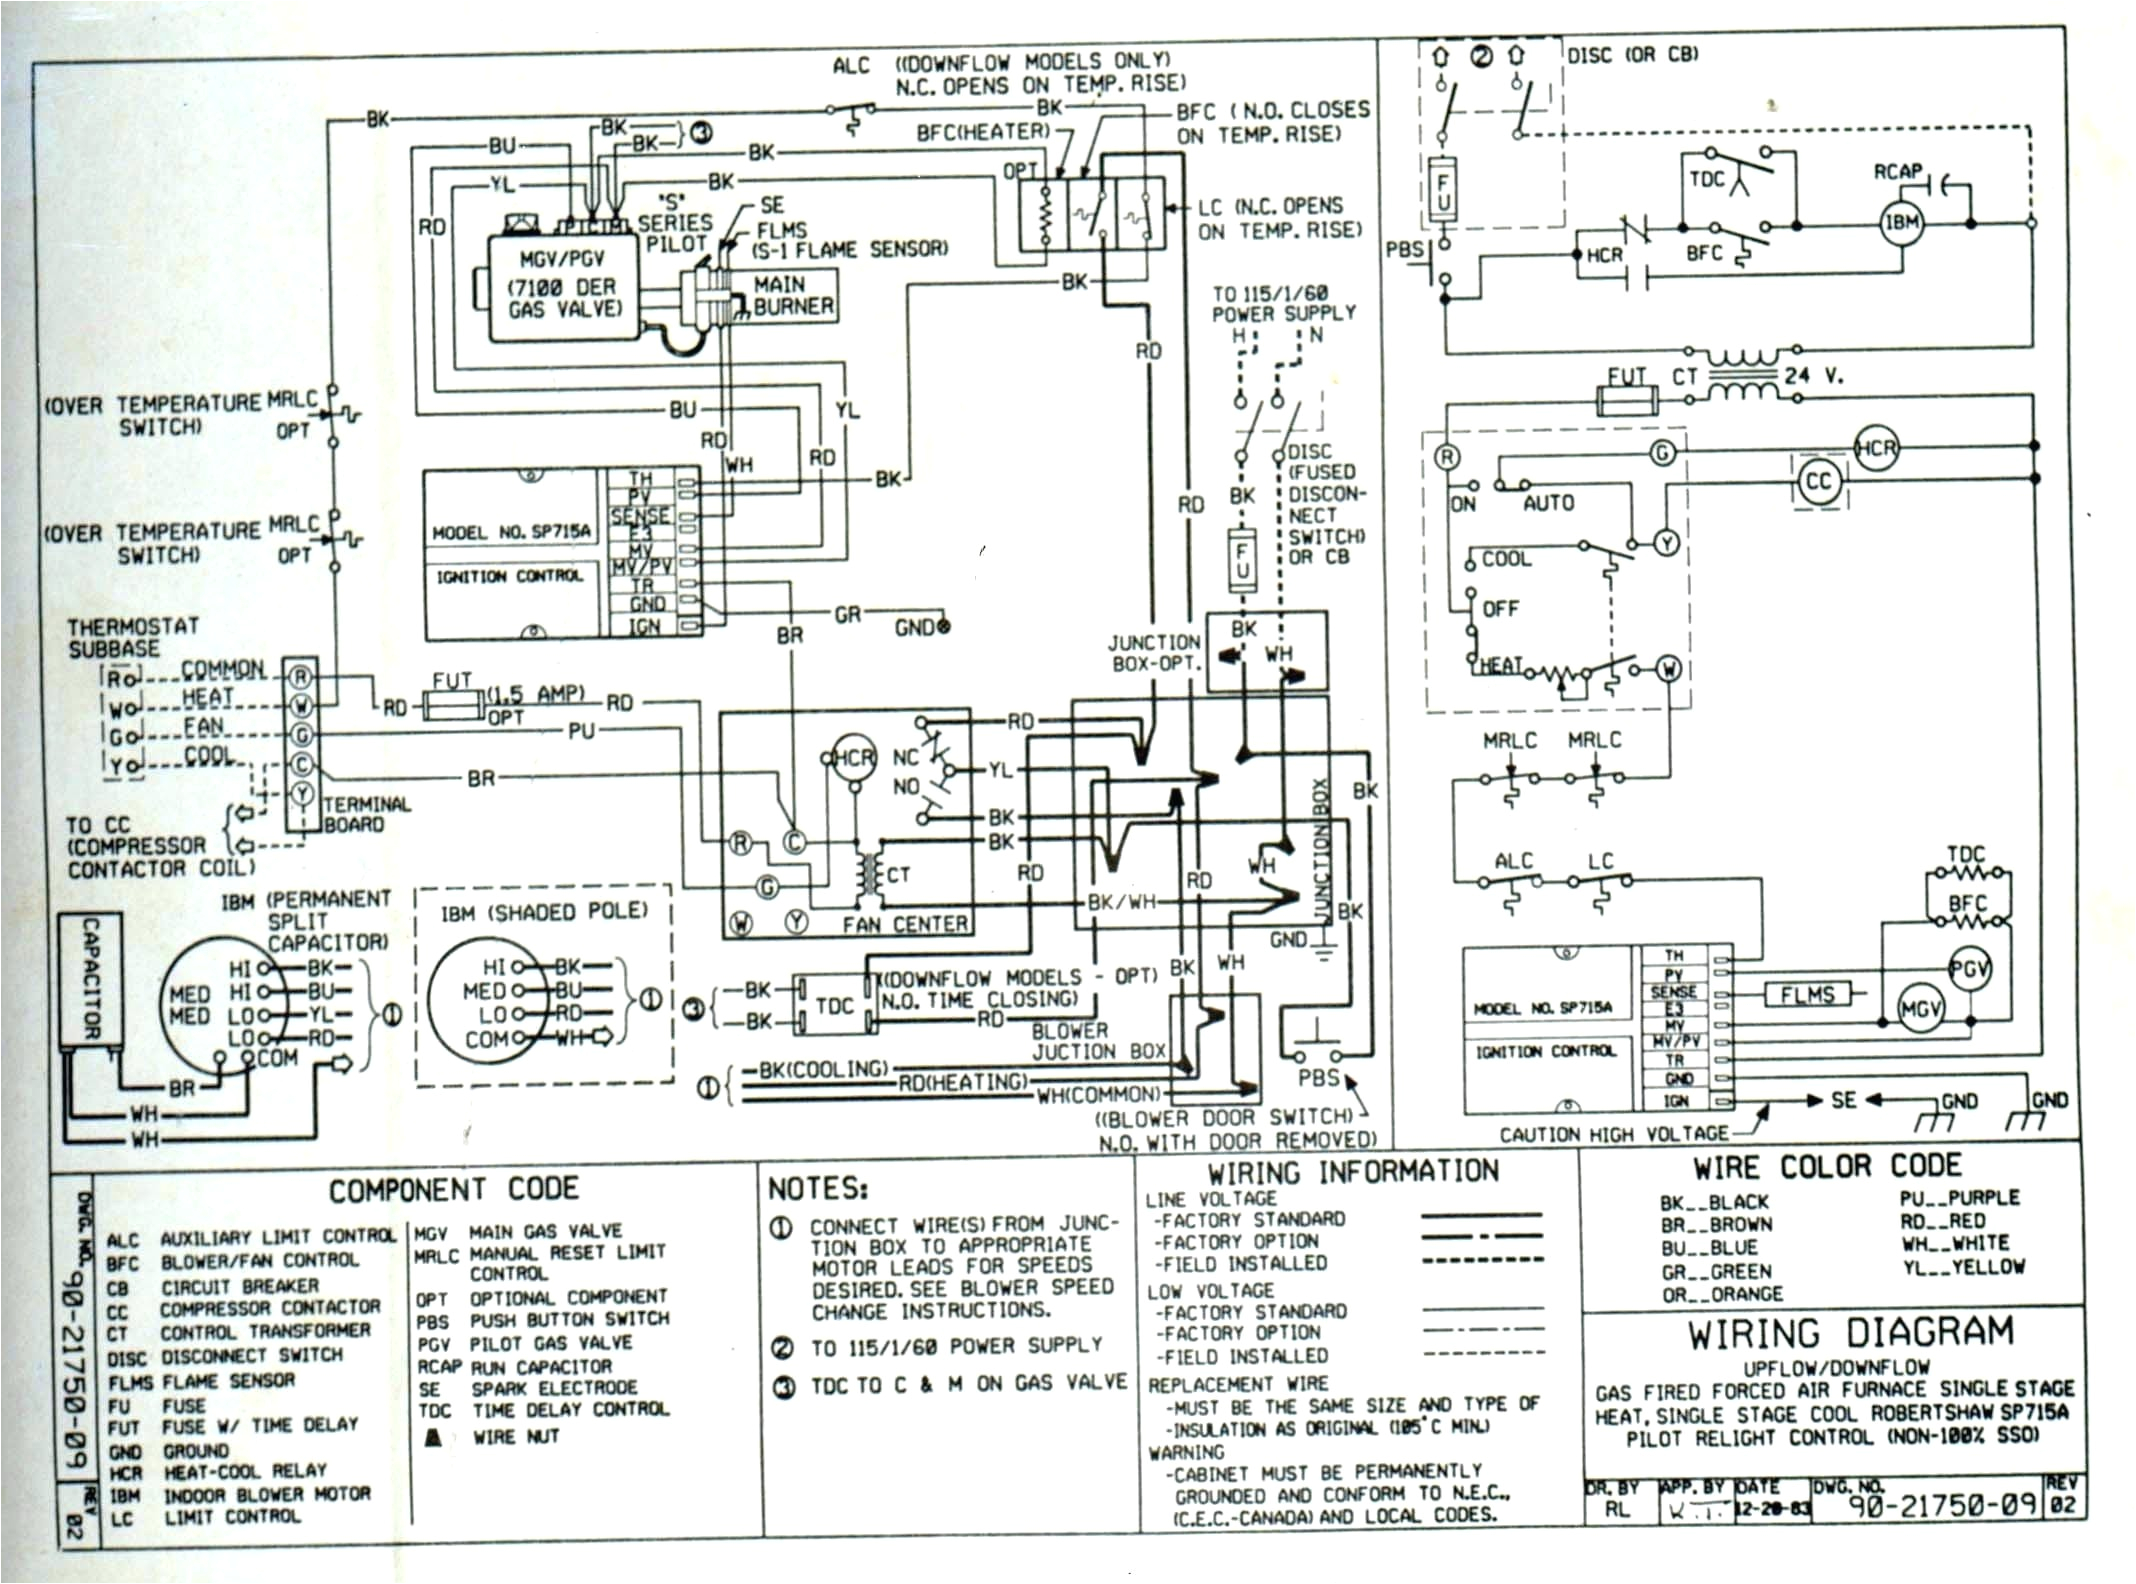 car air conditioning wiring diagram pdf